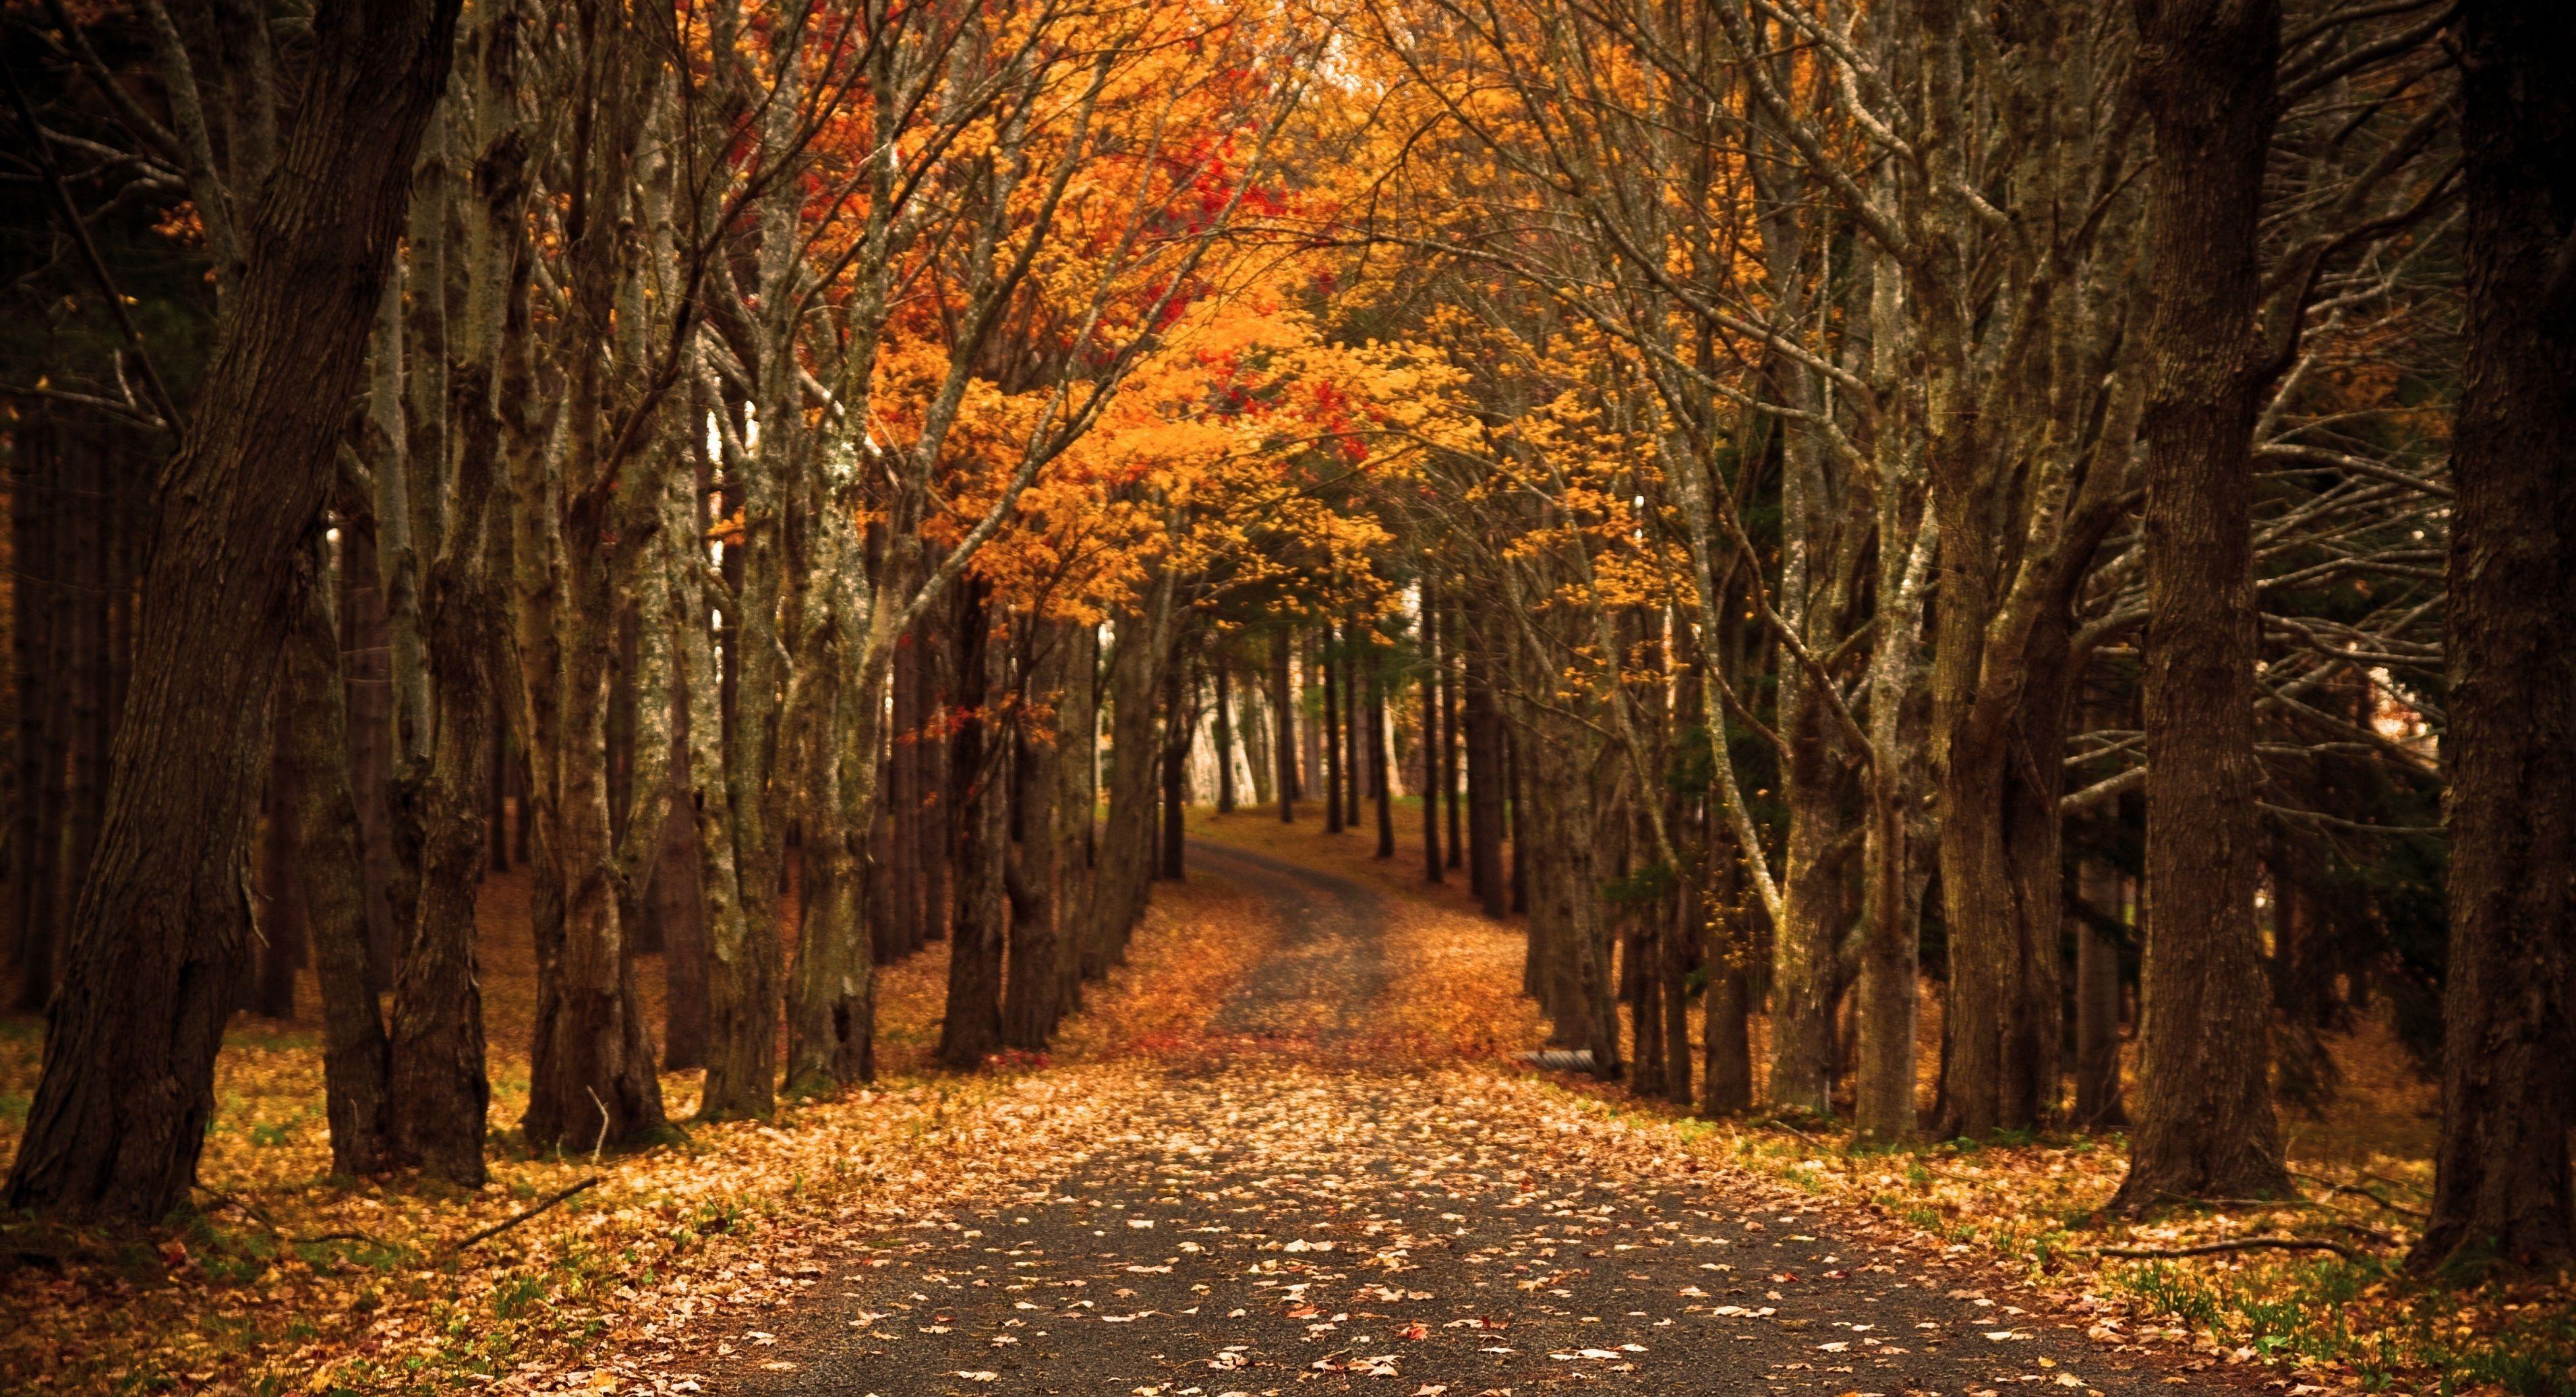 Late Autumn Autumn Wallpaper Hd Fall Wallpaper Backdrops Backgrounds